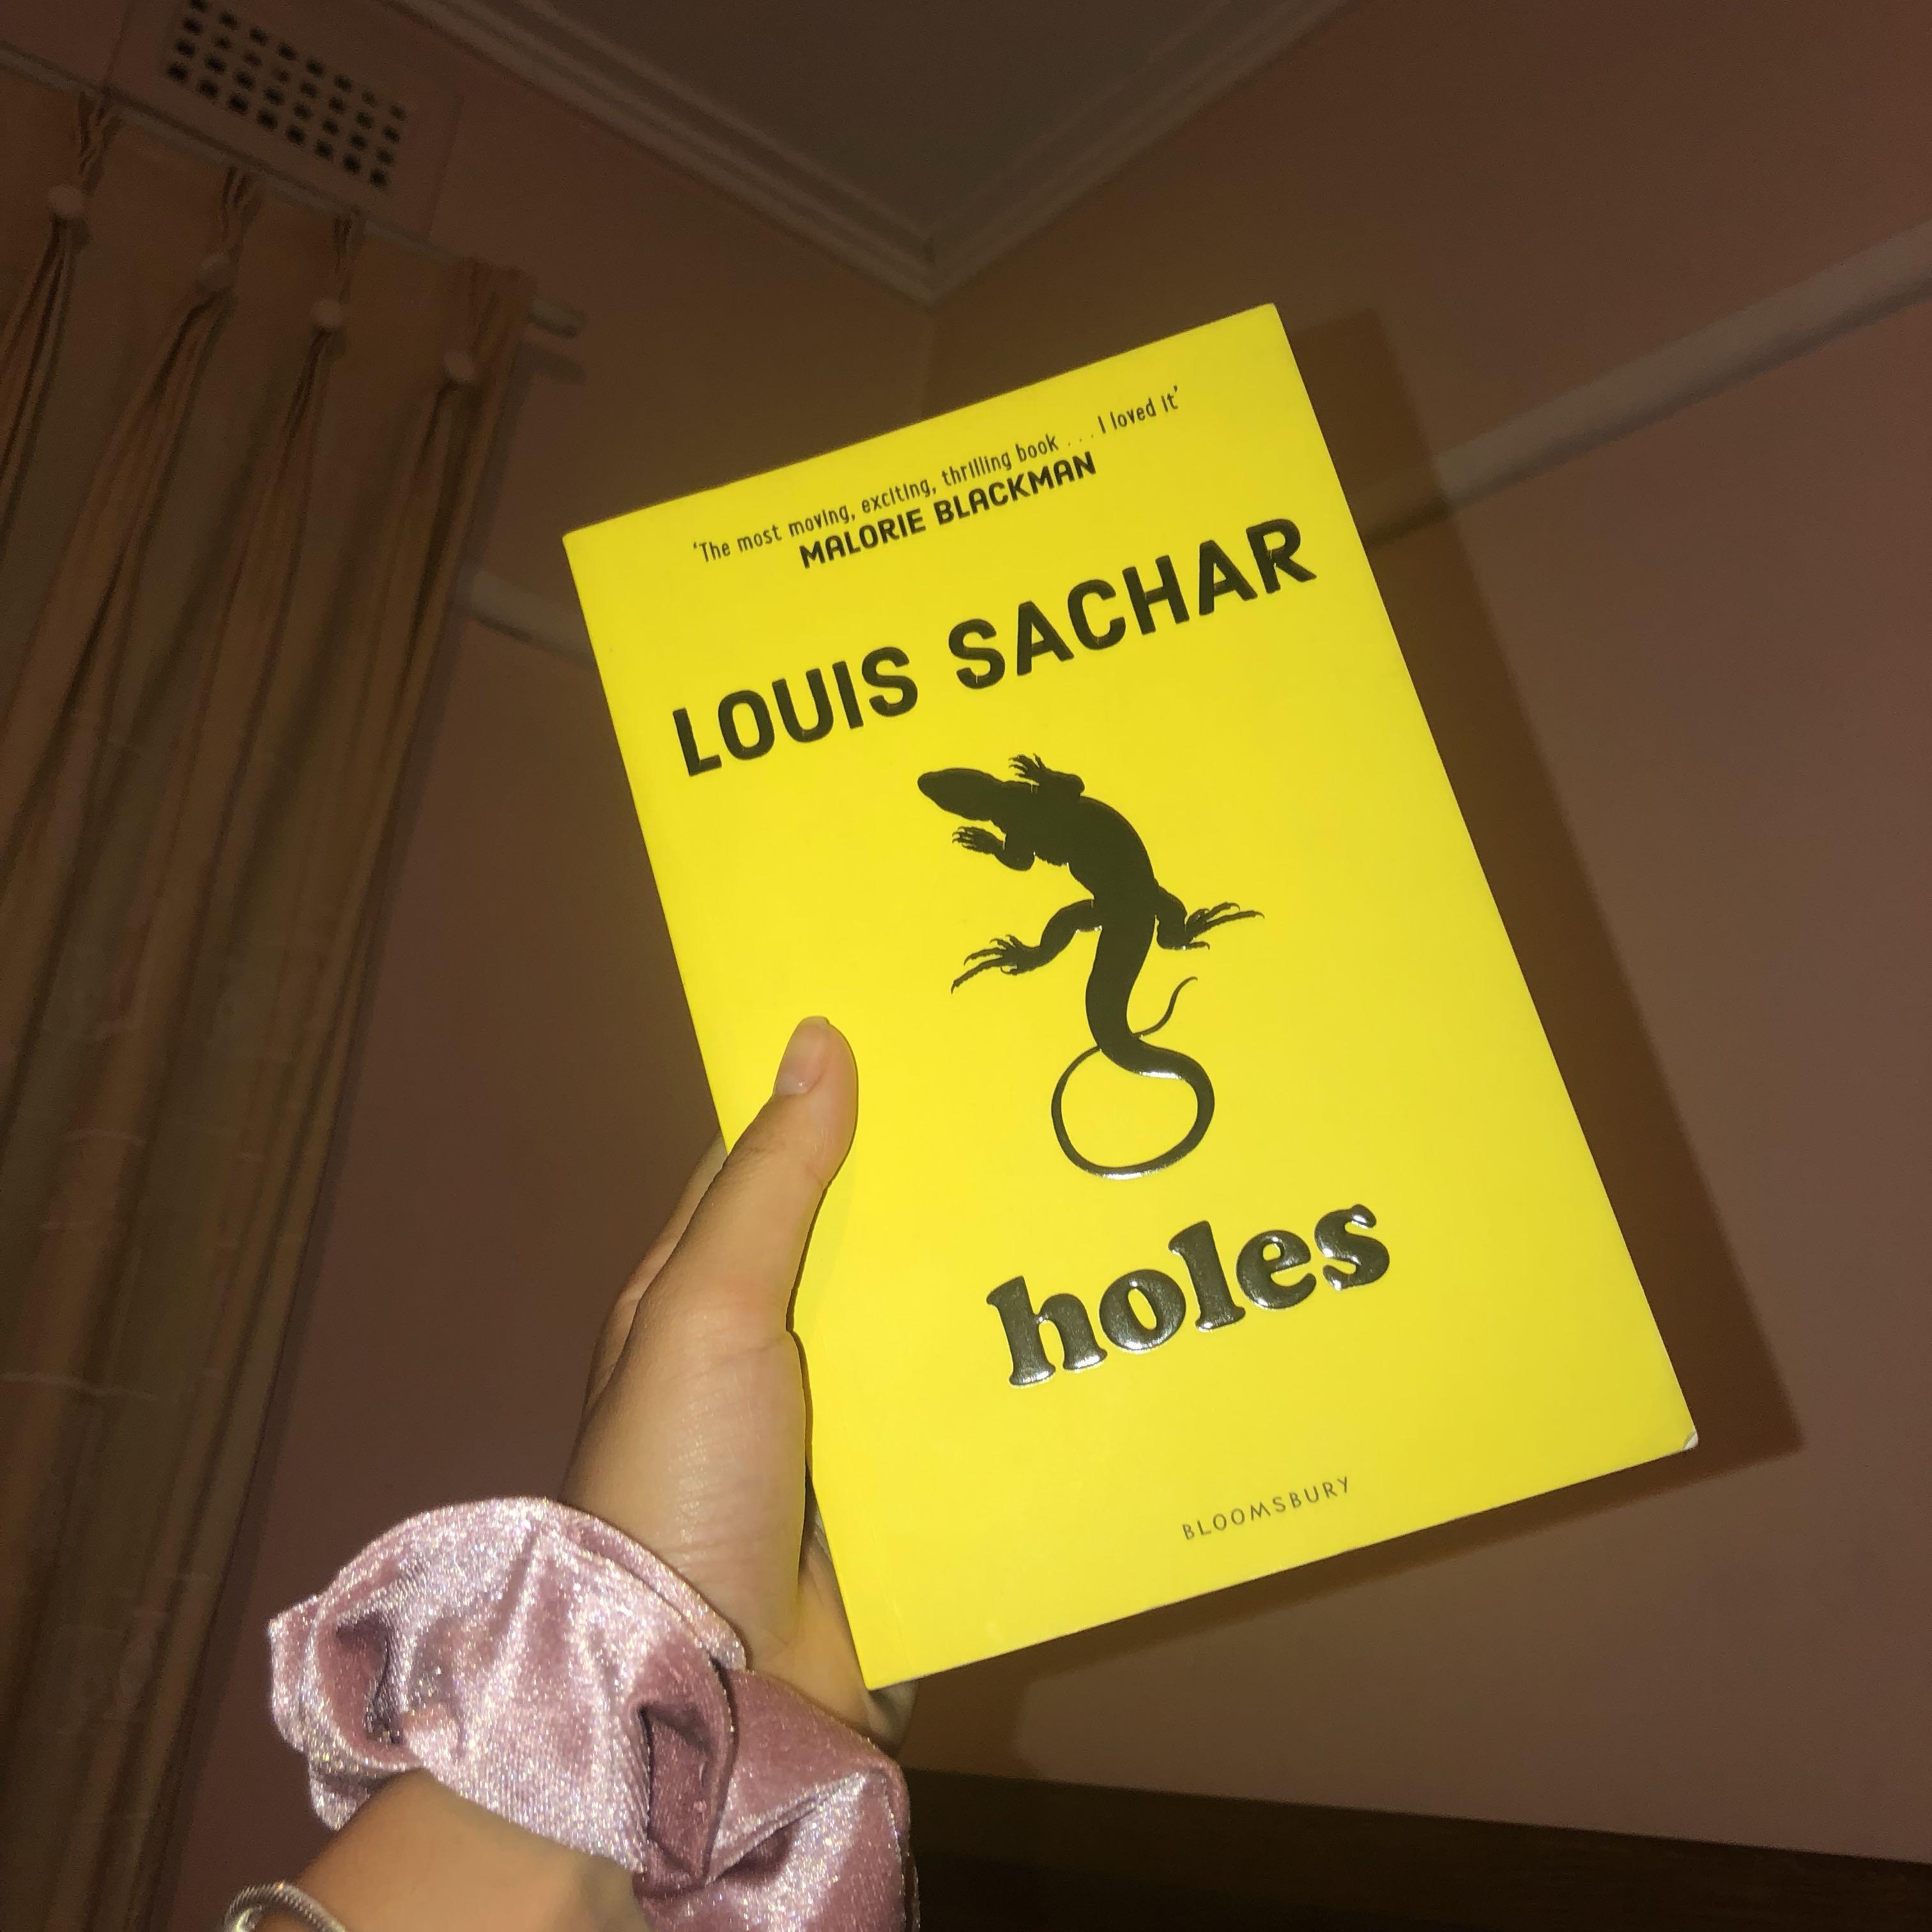 Hole by Louis Sachar